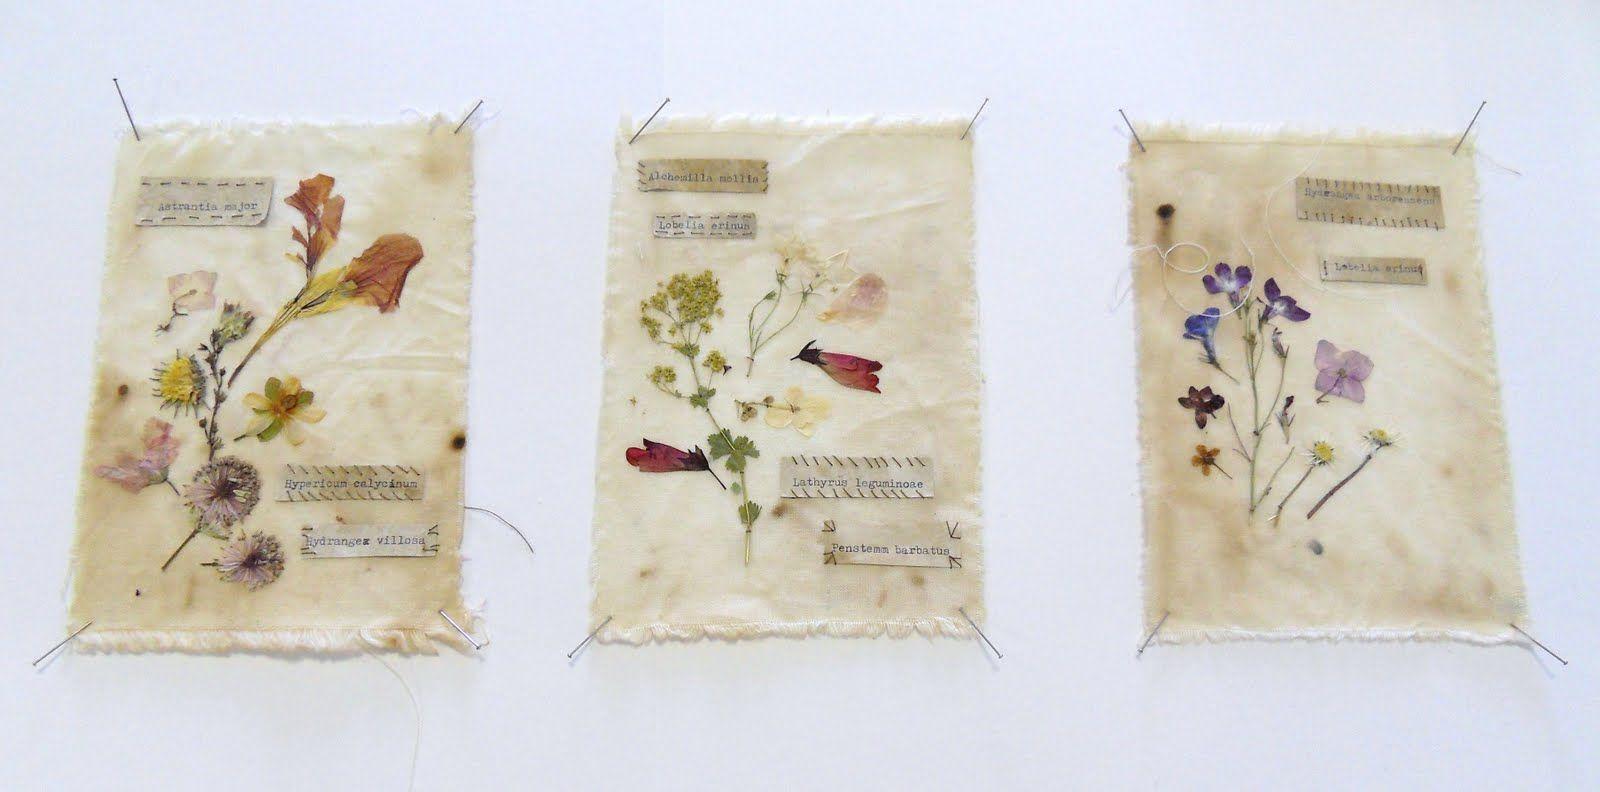 Sarah Elizabeth Walton: Textiles, Art & Design Exhibition